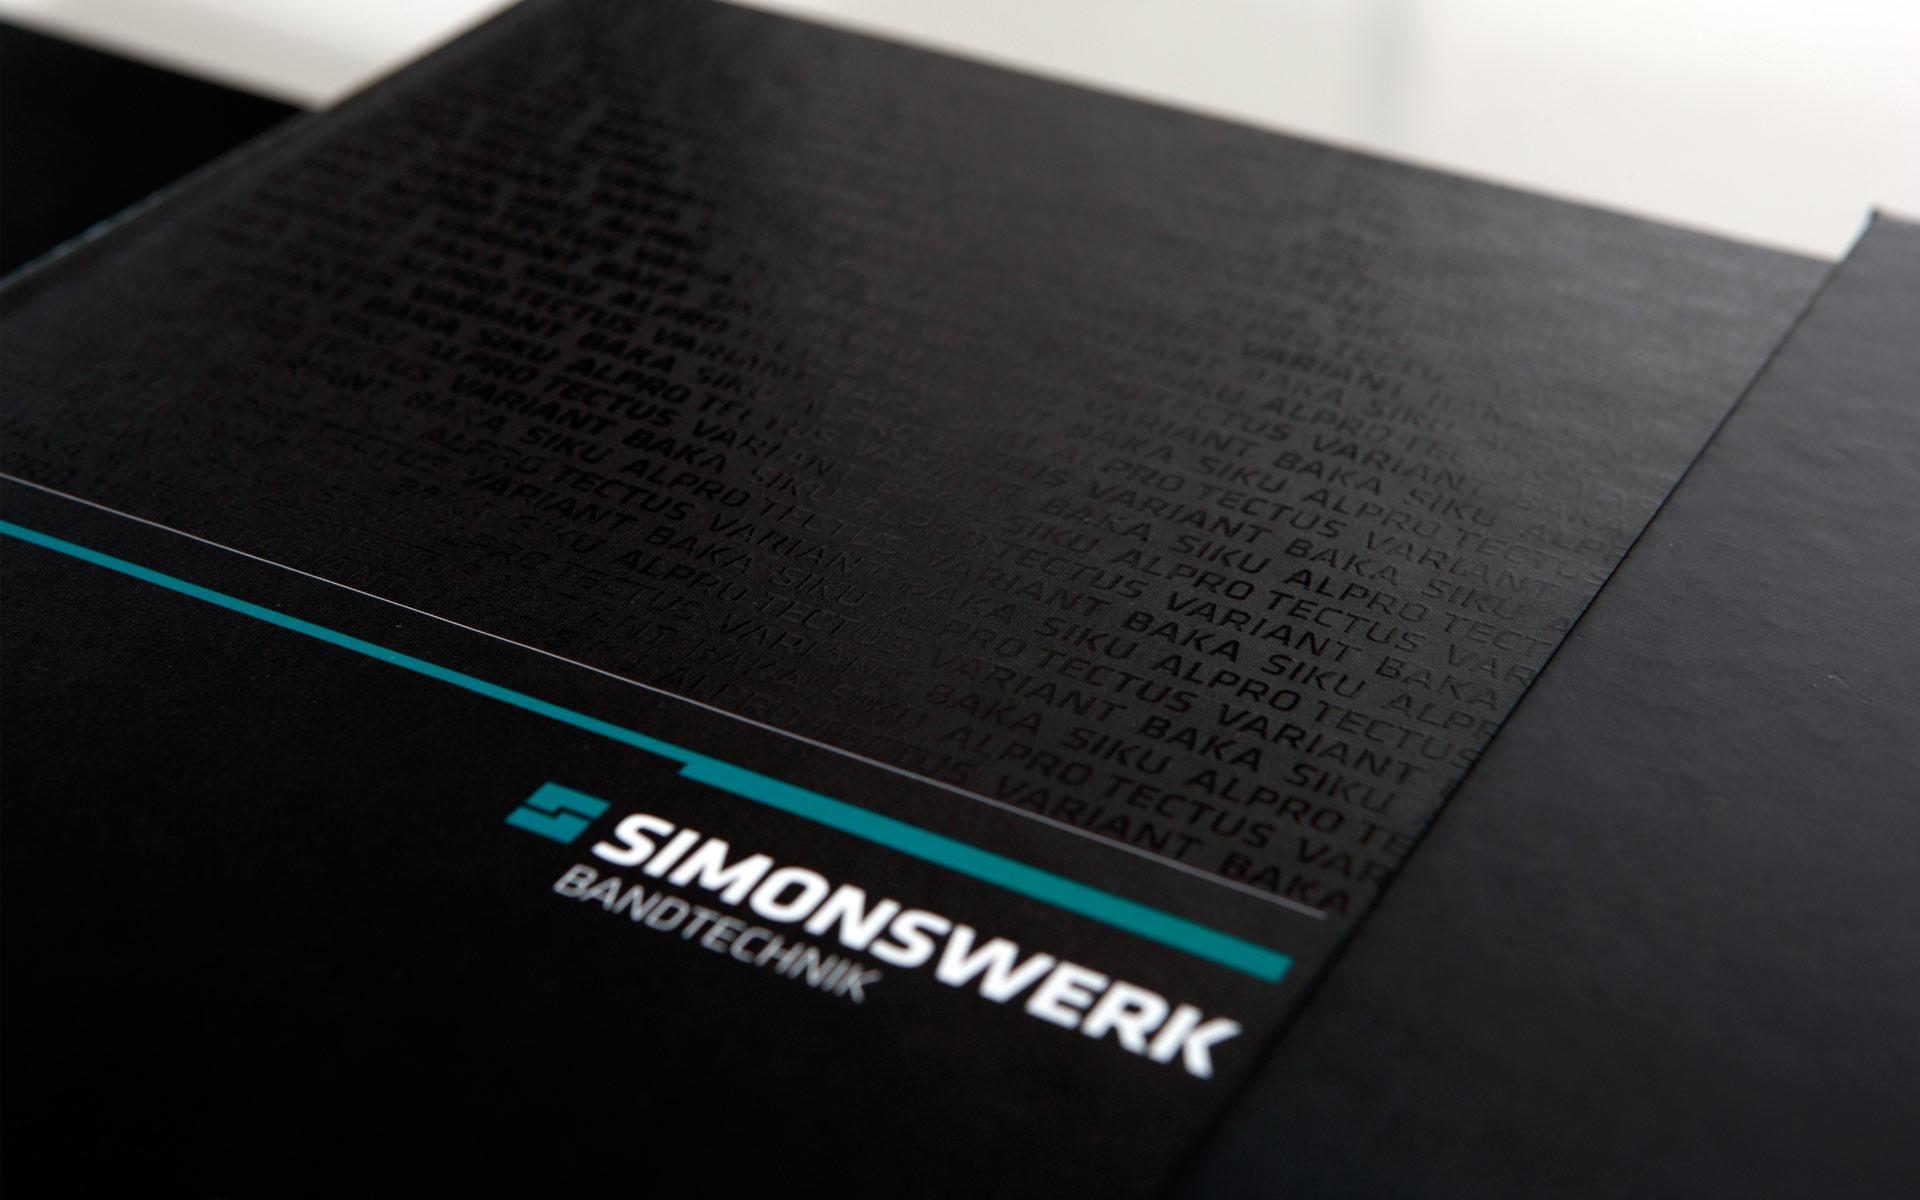 Simonswerk Kompendium 2012, Handbuch, Titel Detail